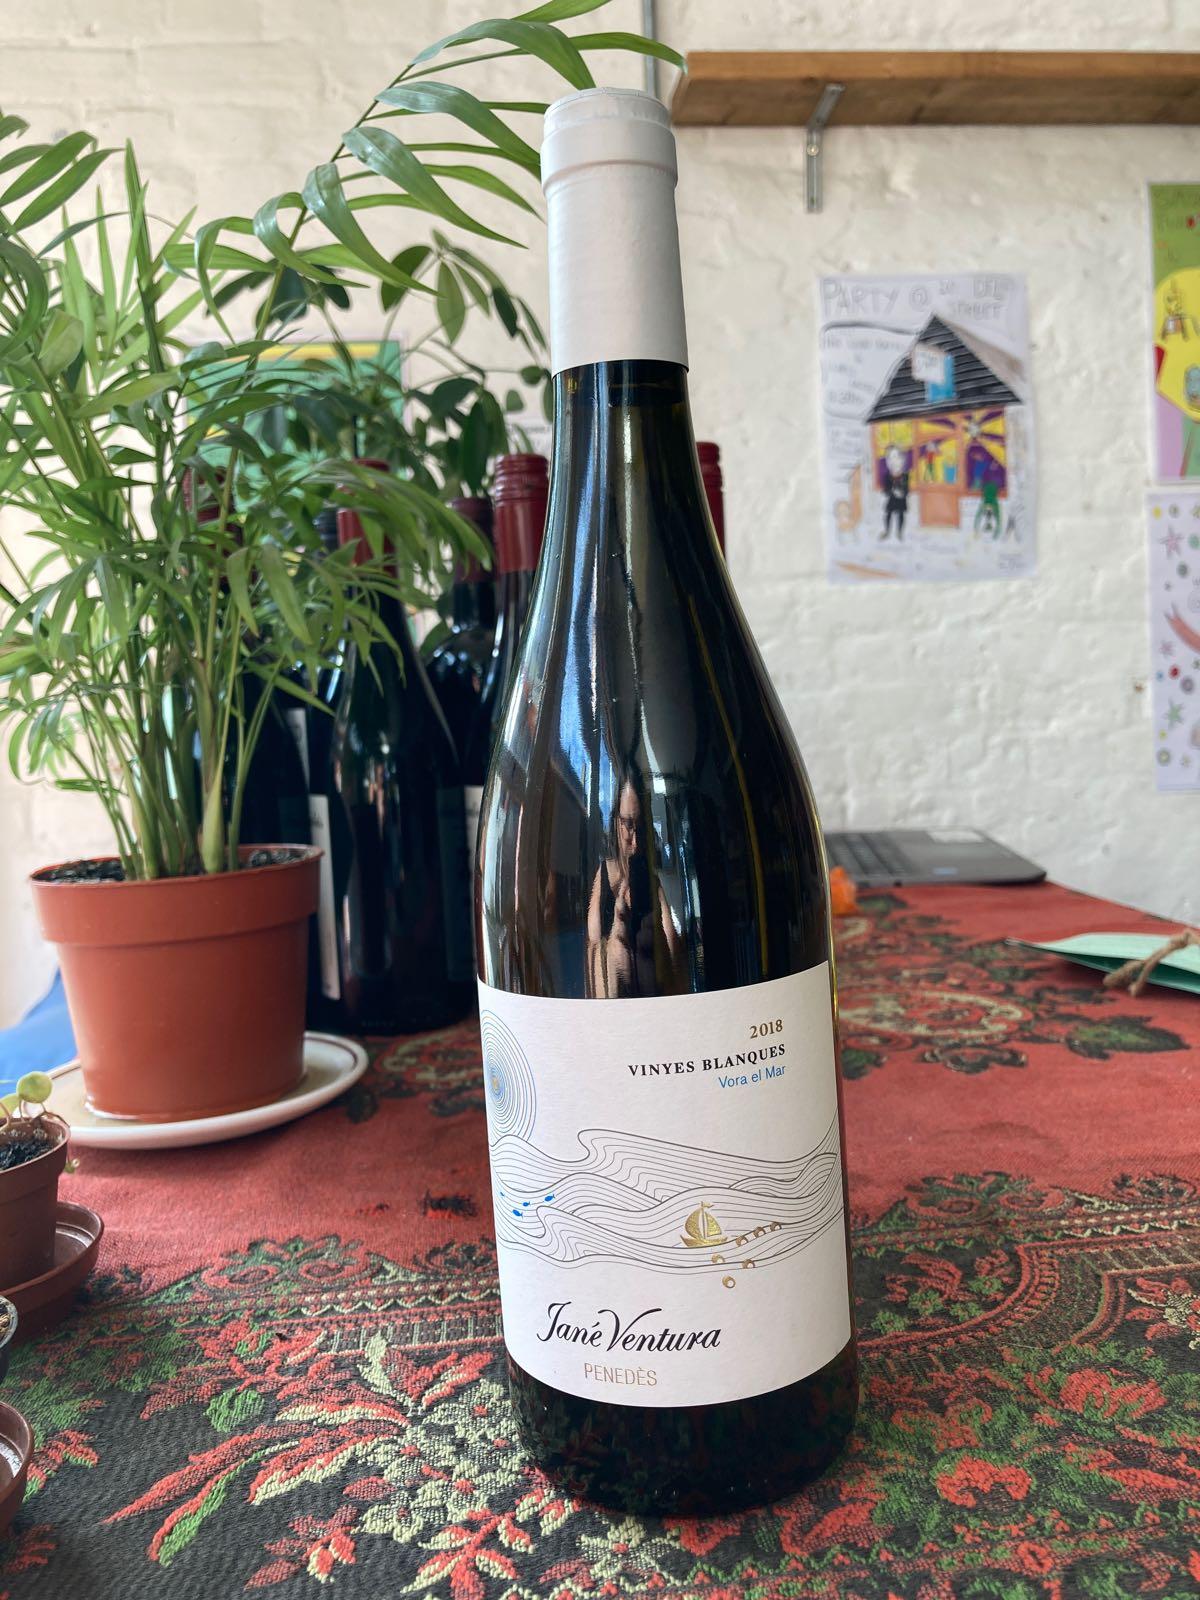 Jané Ventura - Vora el Mar, Vinyes Blanques (12.5%) (Catalunya, Spain)